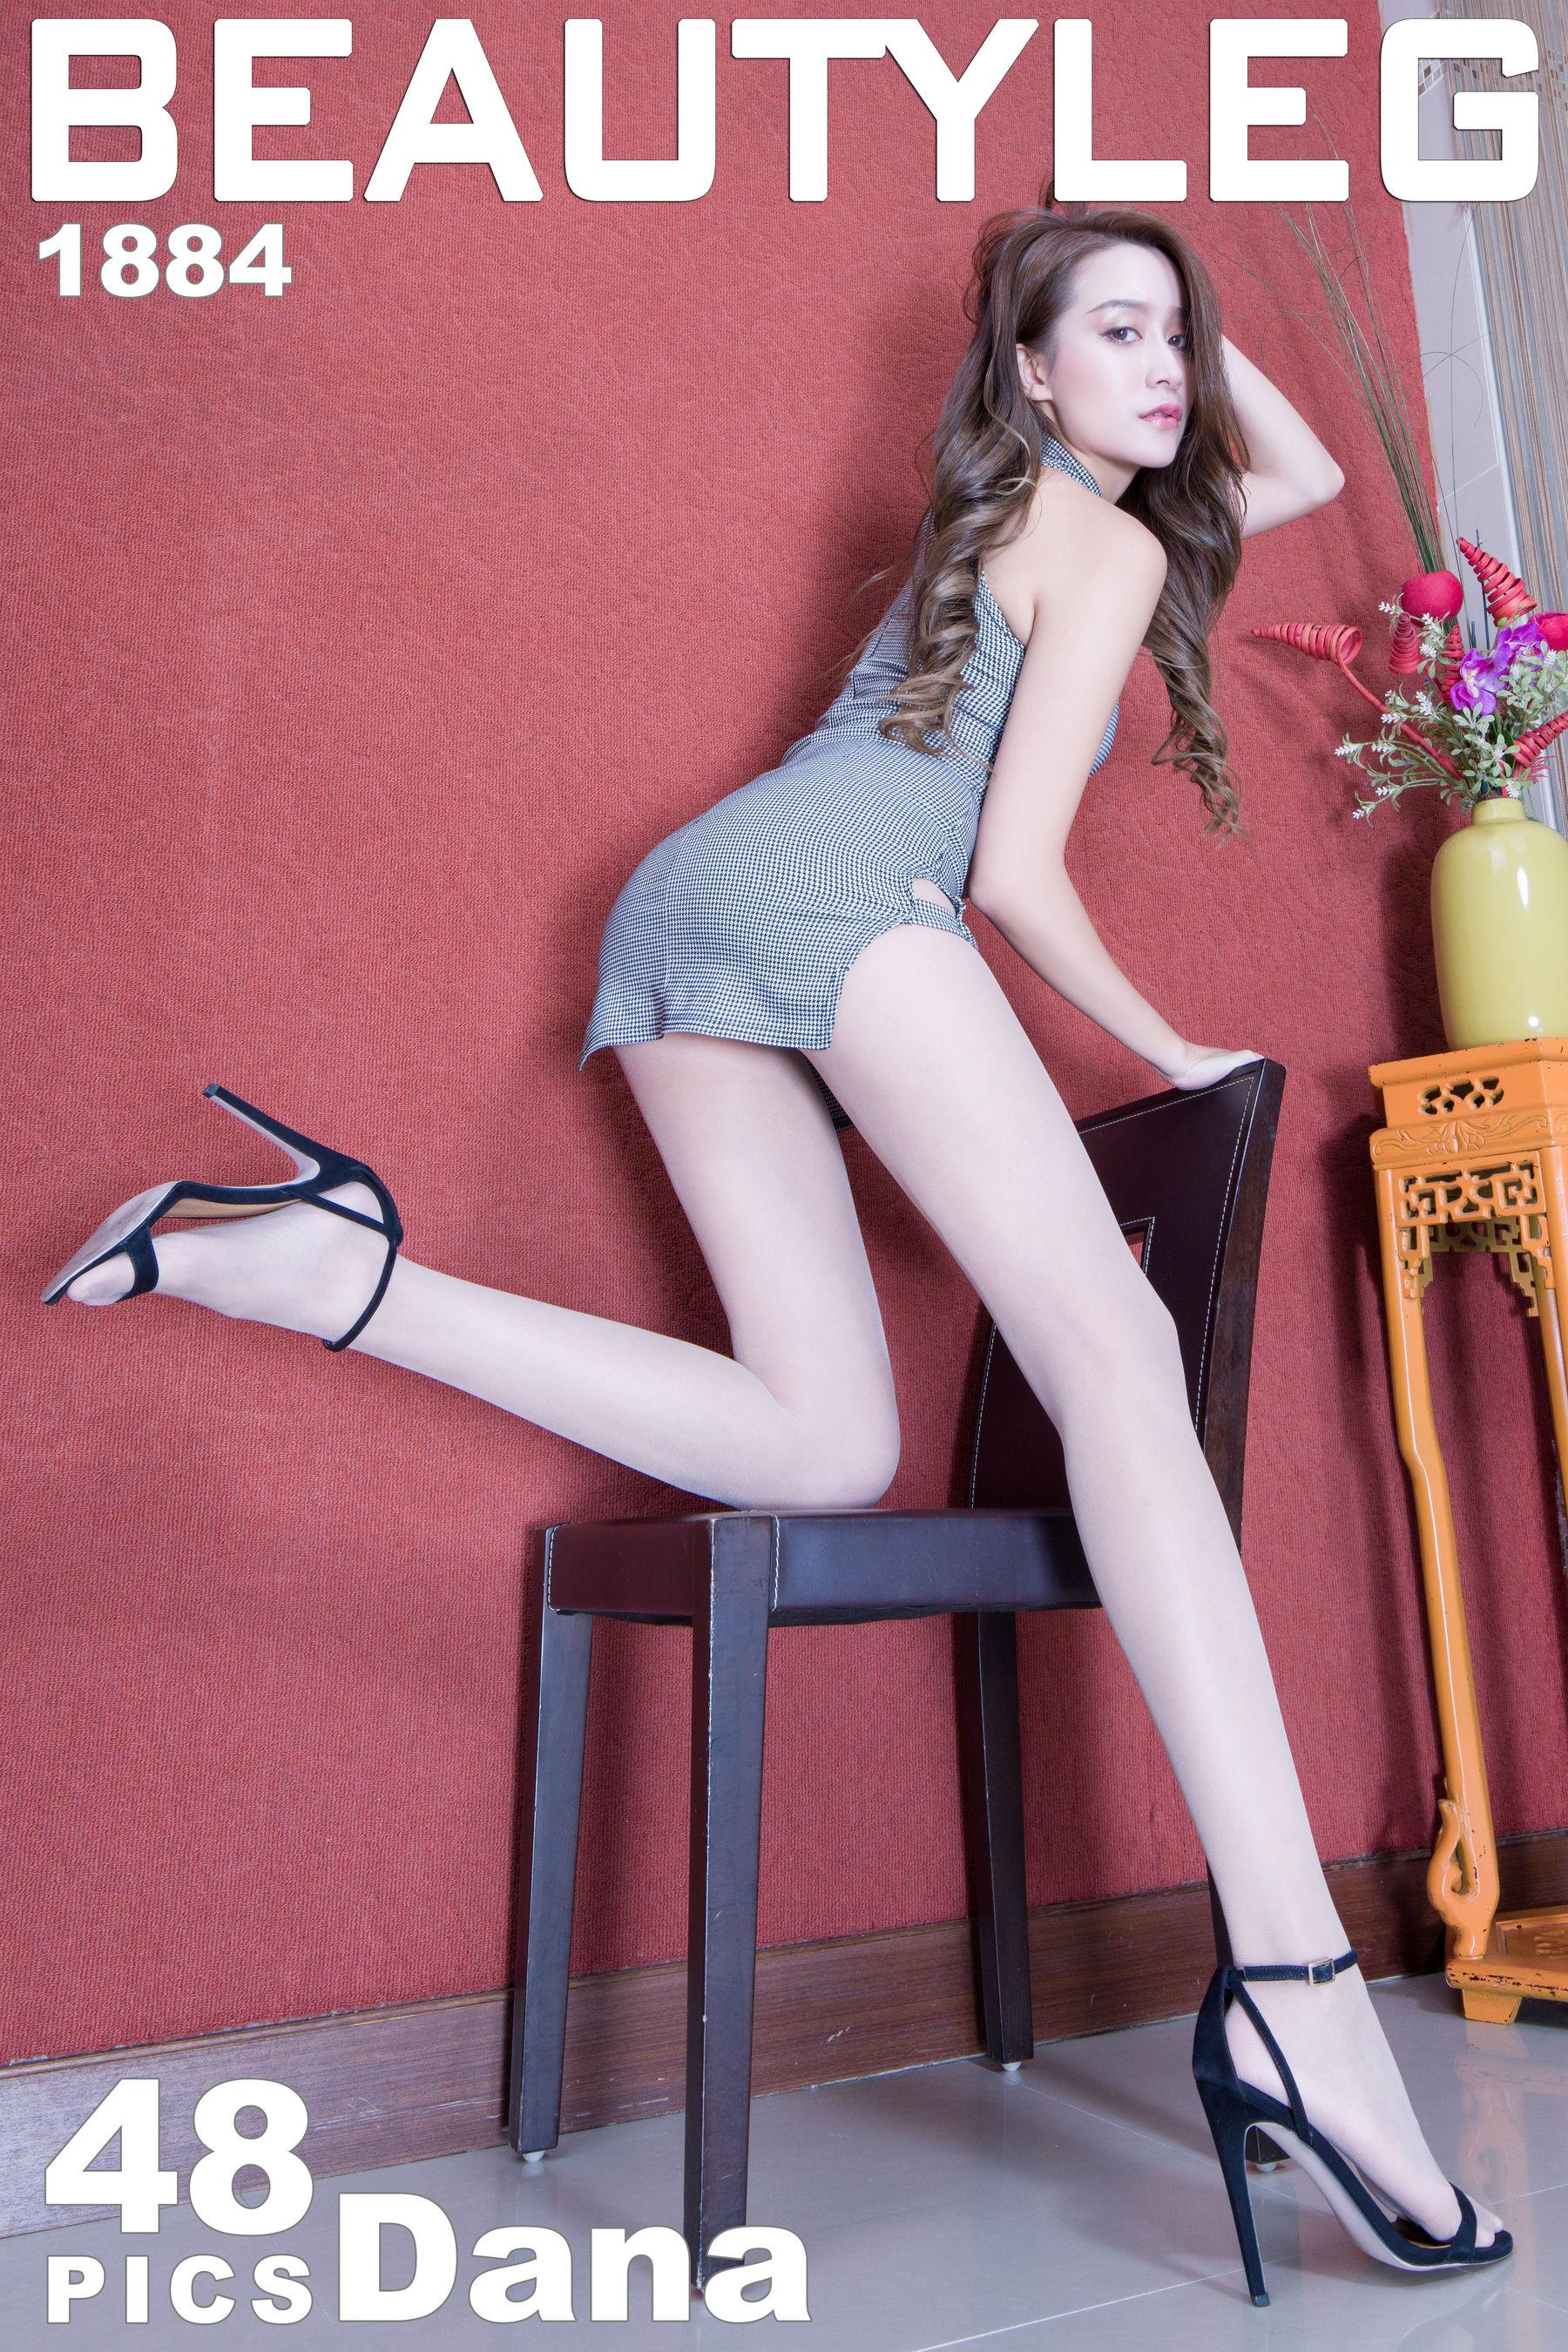 VOL.106 [Beautyleg]美腿高跟:孟晓艺(孟晓艺Dana)超高清个人性感漂亮大图(43P)